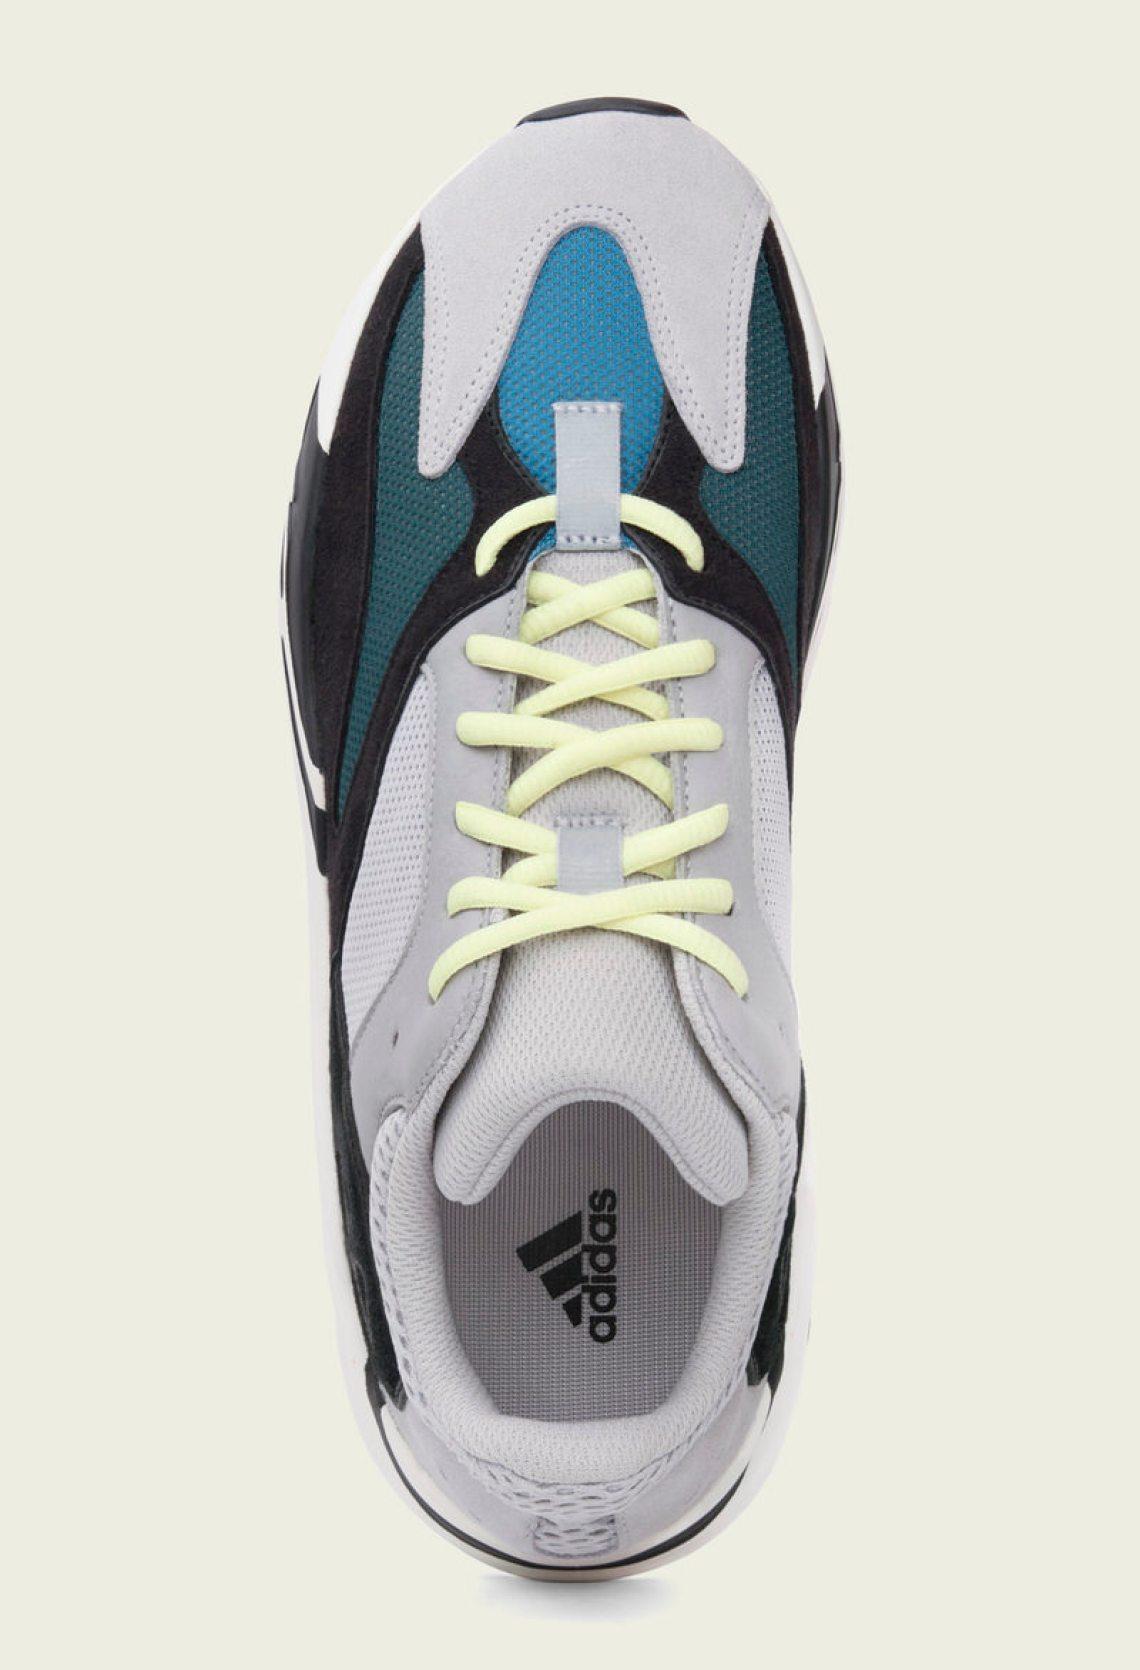 a360aa5b383 adidas Yeezy Boost 700 OG adidas Yeezy Boost 700 OG